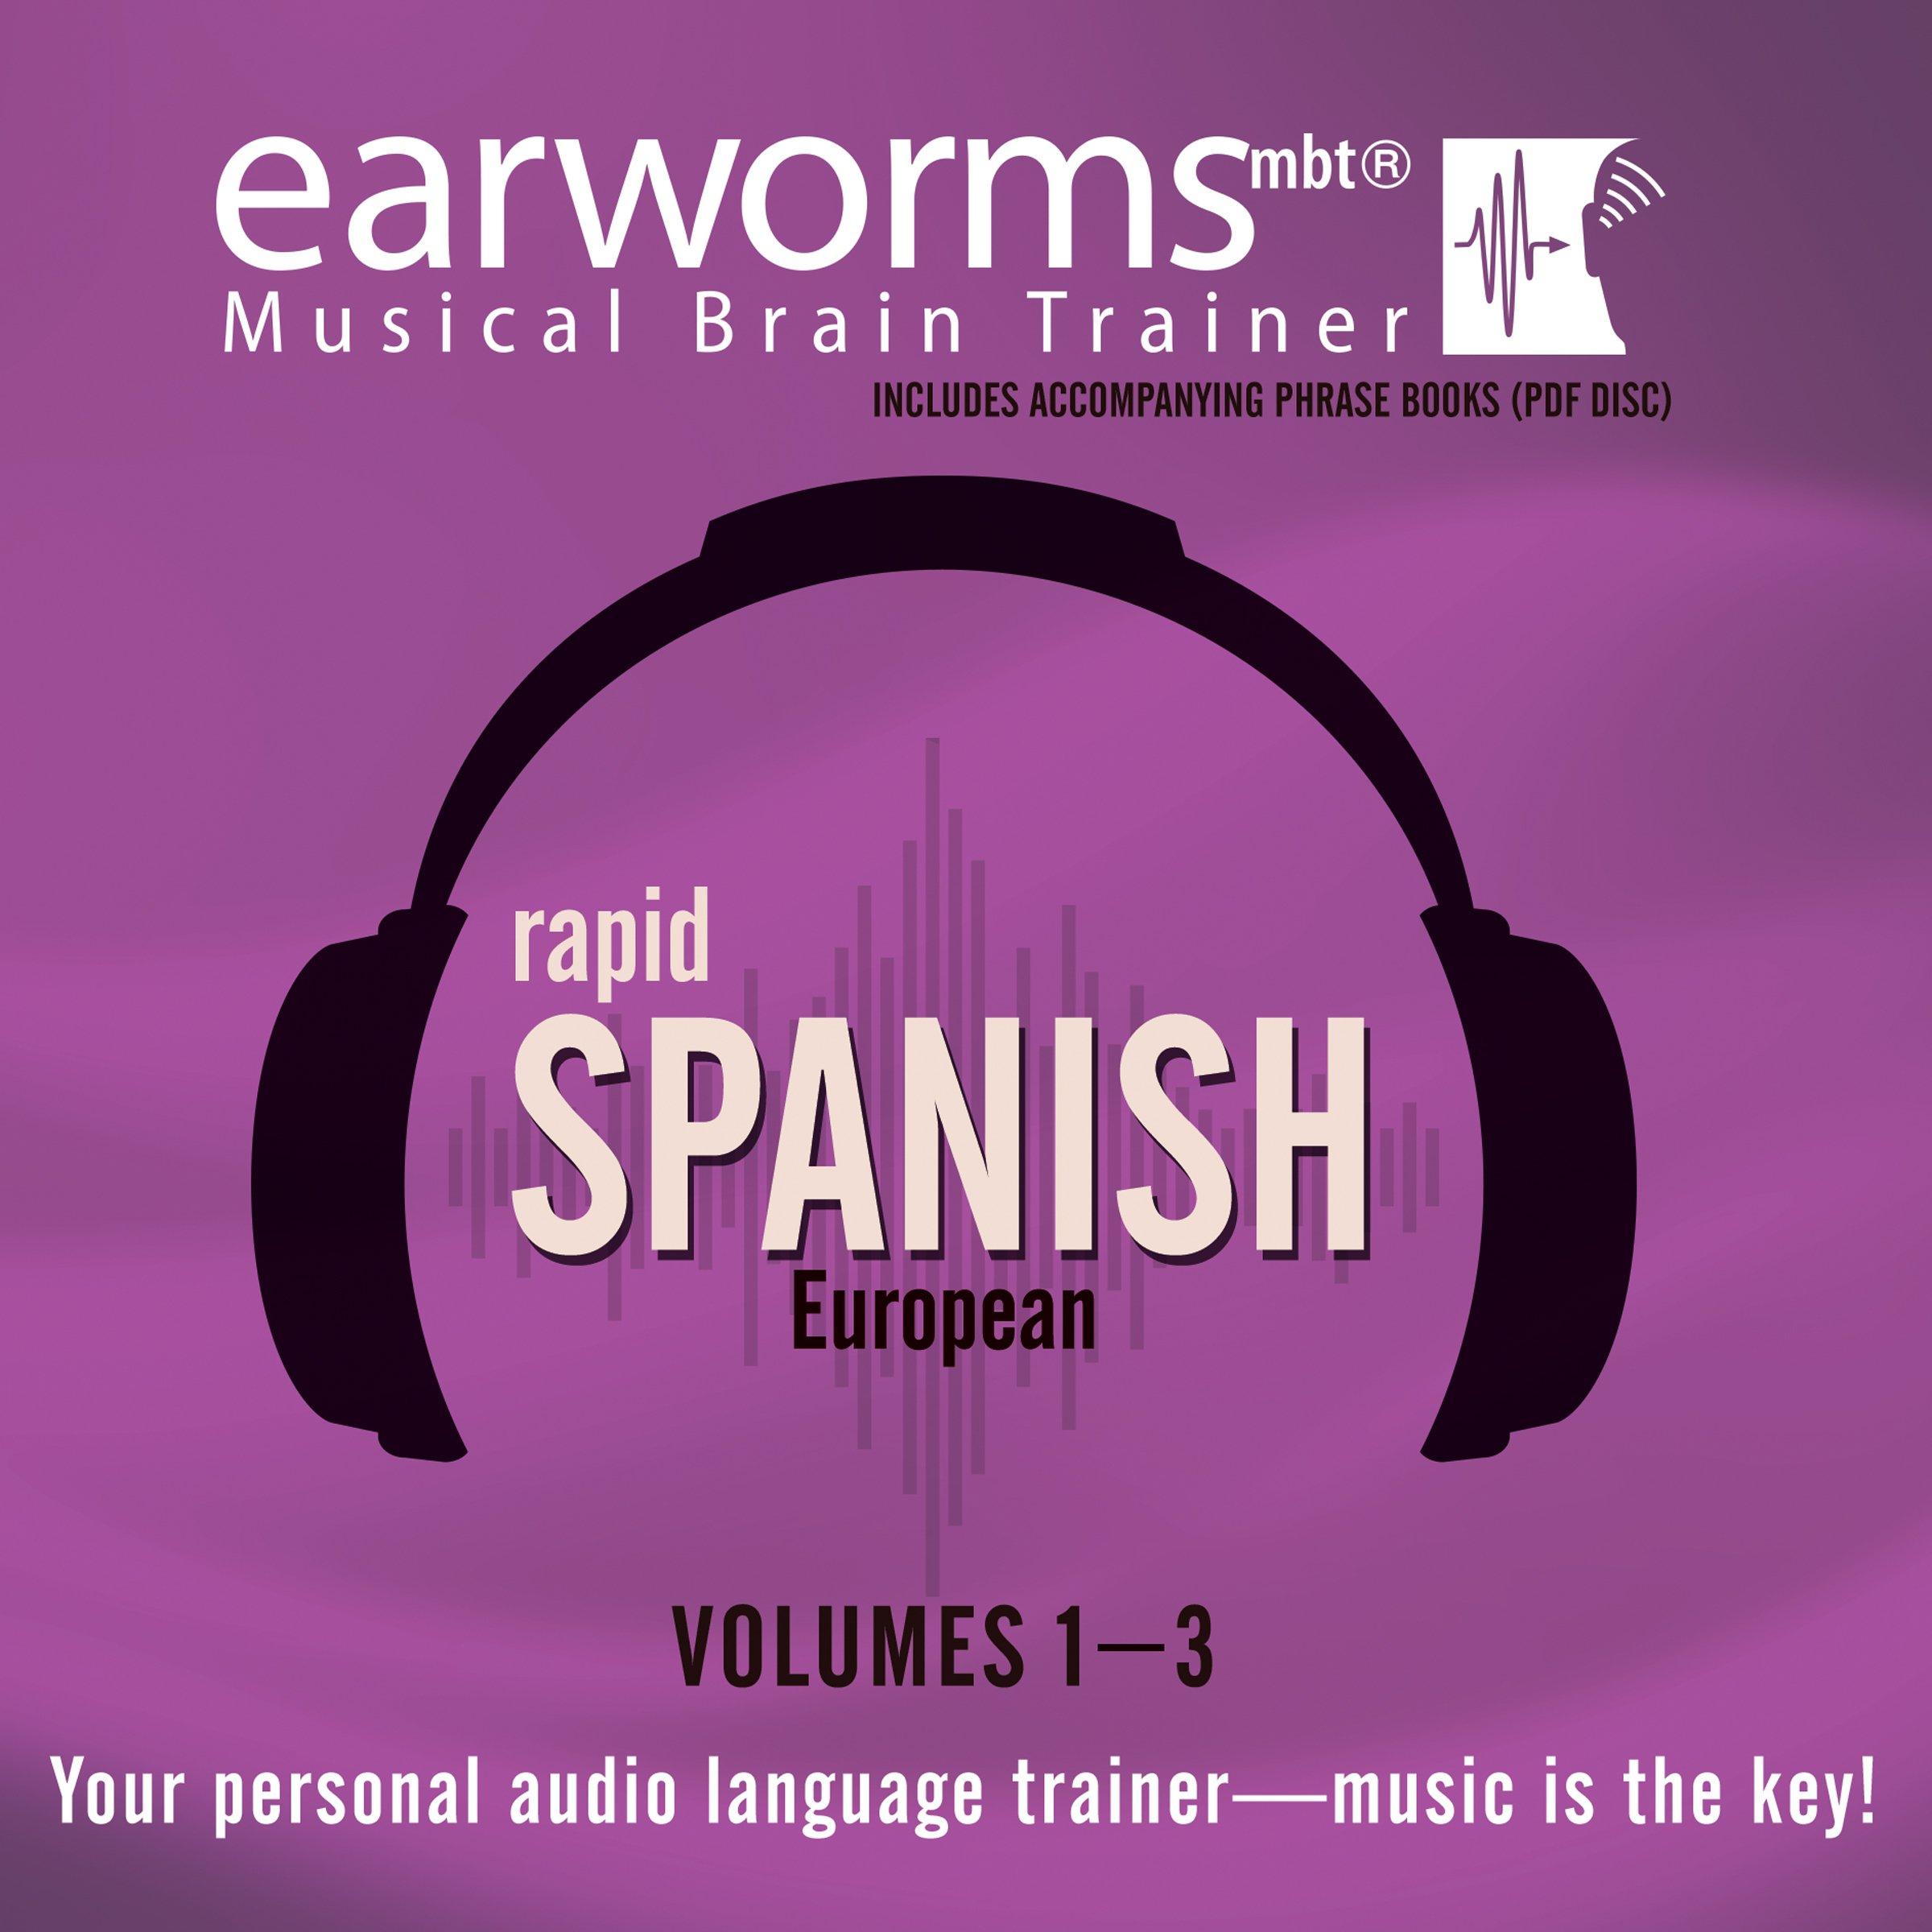 94c94cf0abce 1-3 (Earworms) (Spanish) Audio CD – Audiobook